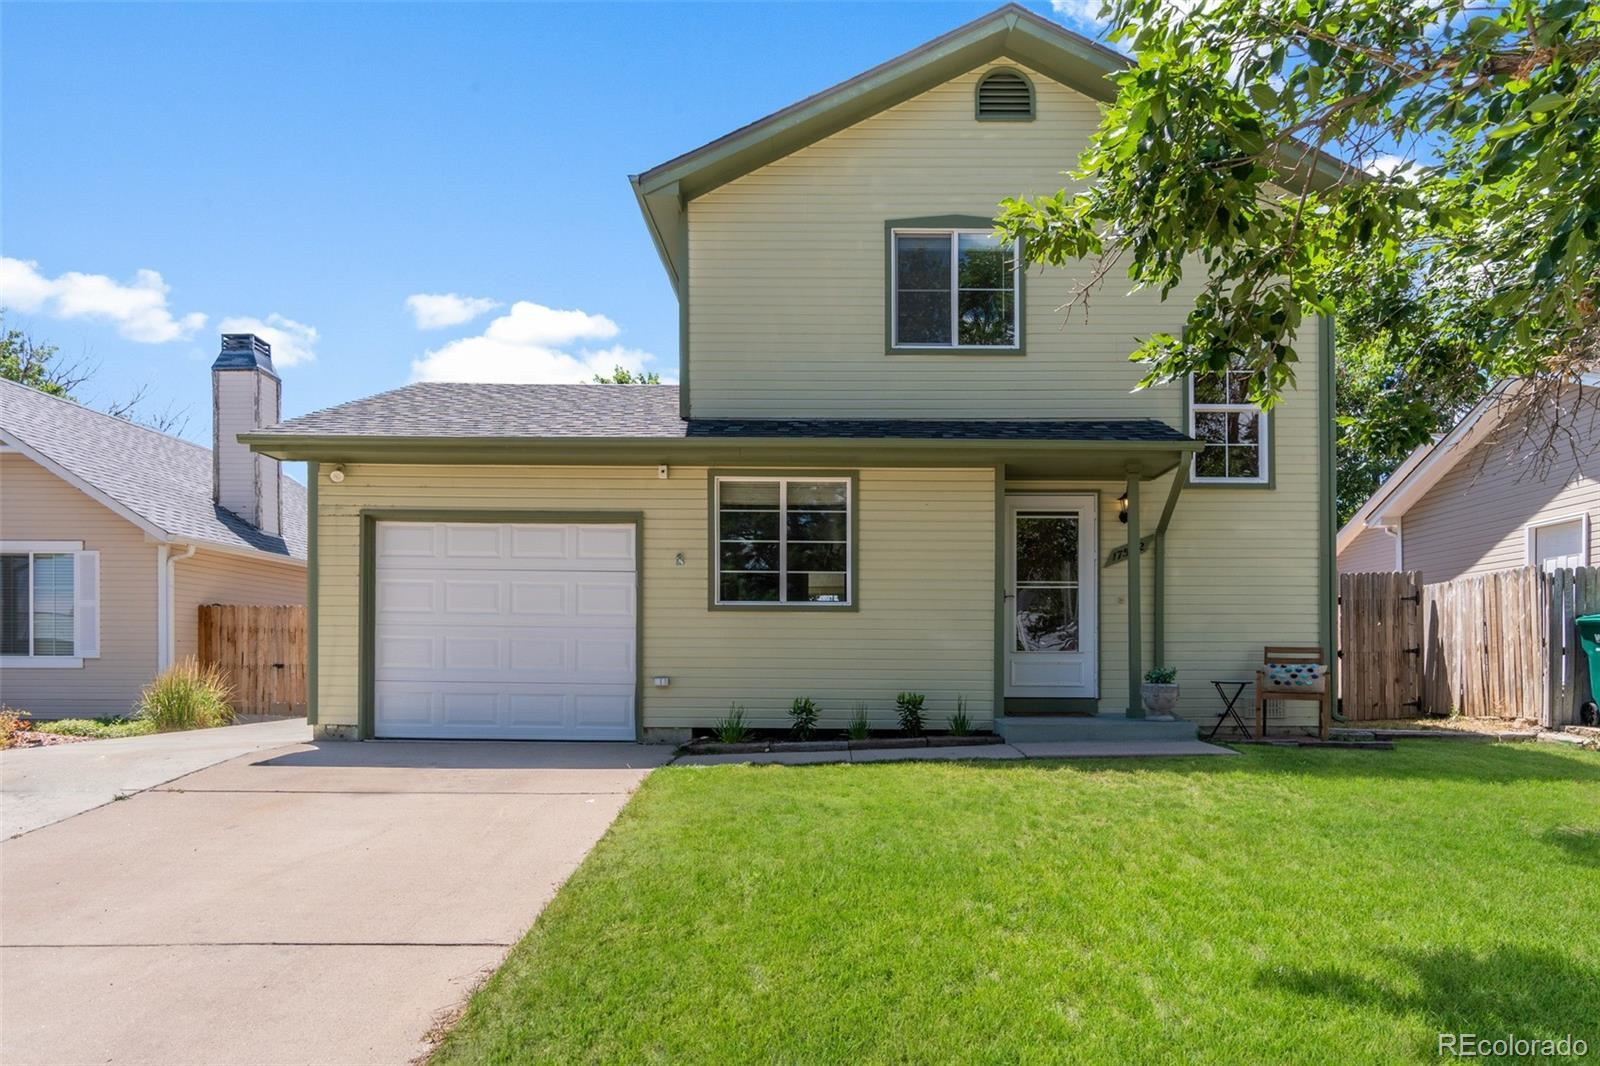 17532 E Whitaker Drive, Aurora, CO 80015 - MLS#: 5165565